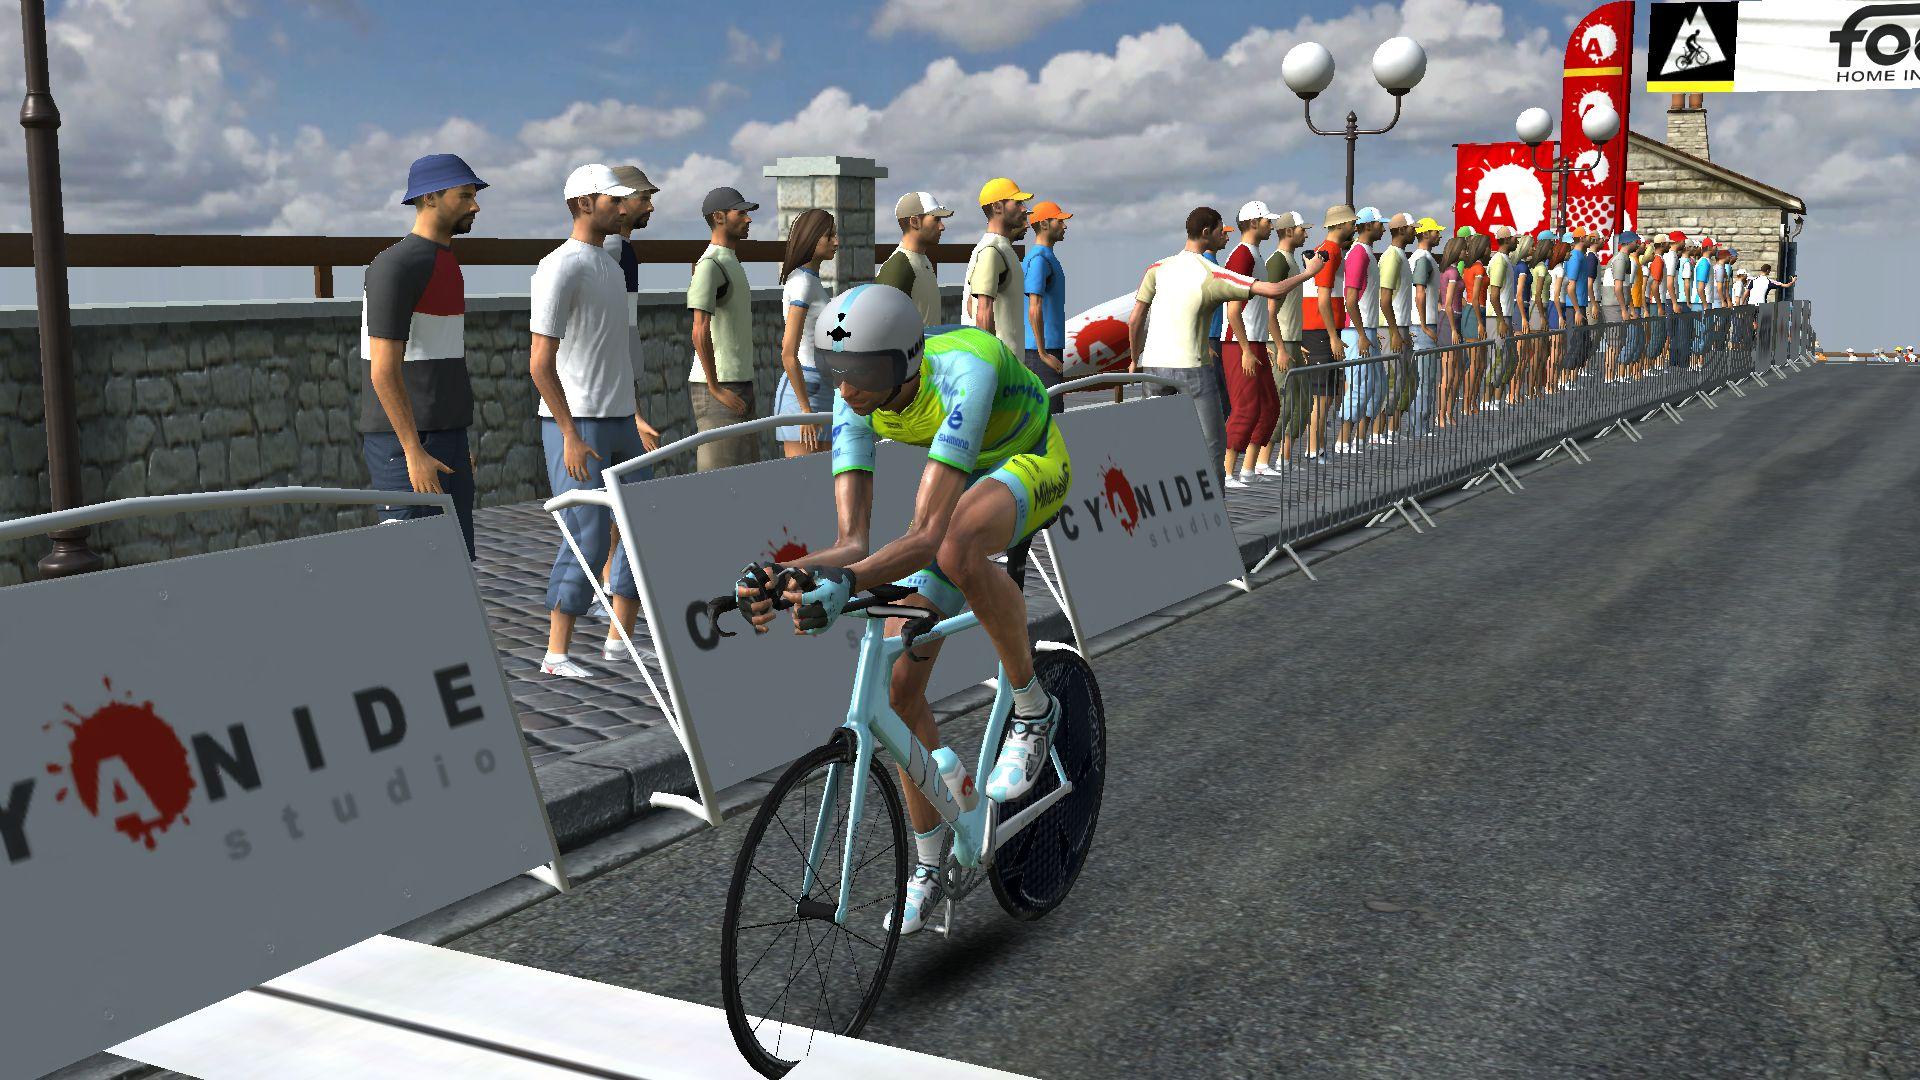 pcmdaily.com/images/mg/2019/Races/GTM/Giro/mg19_giro_09_PCM0063.jpg